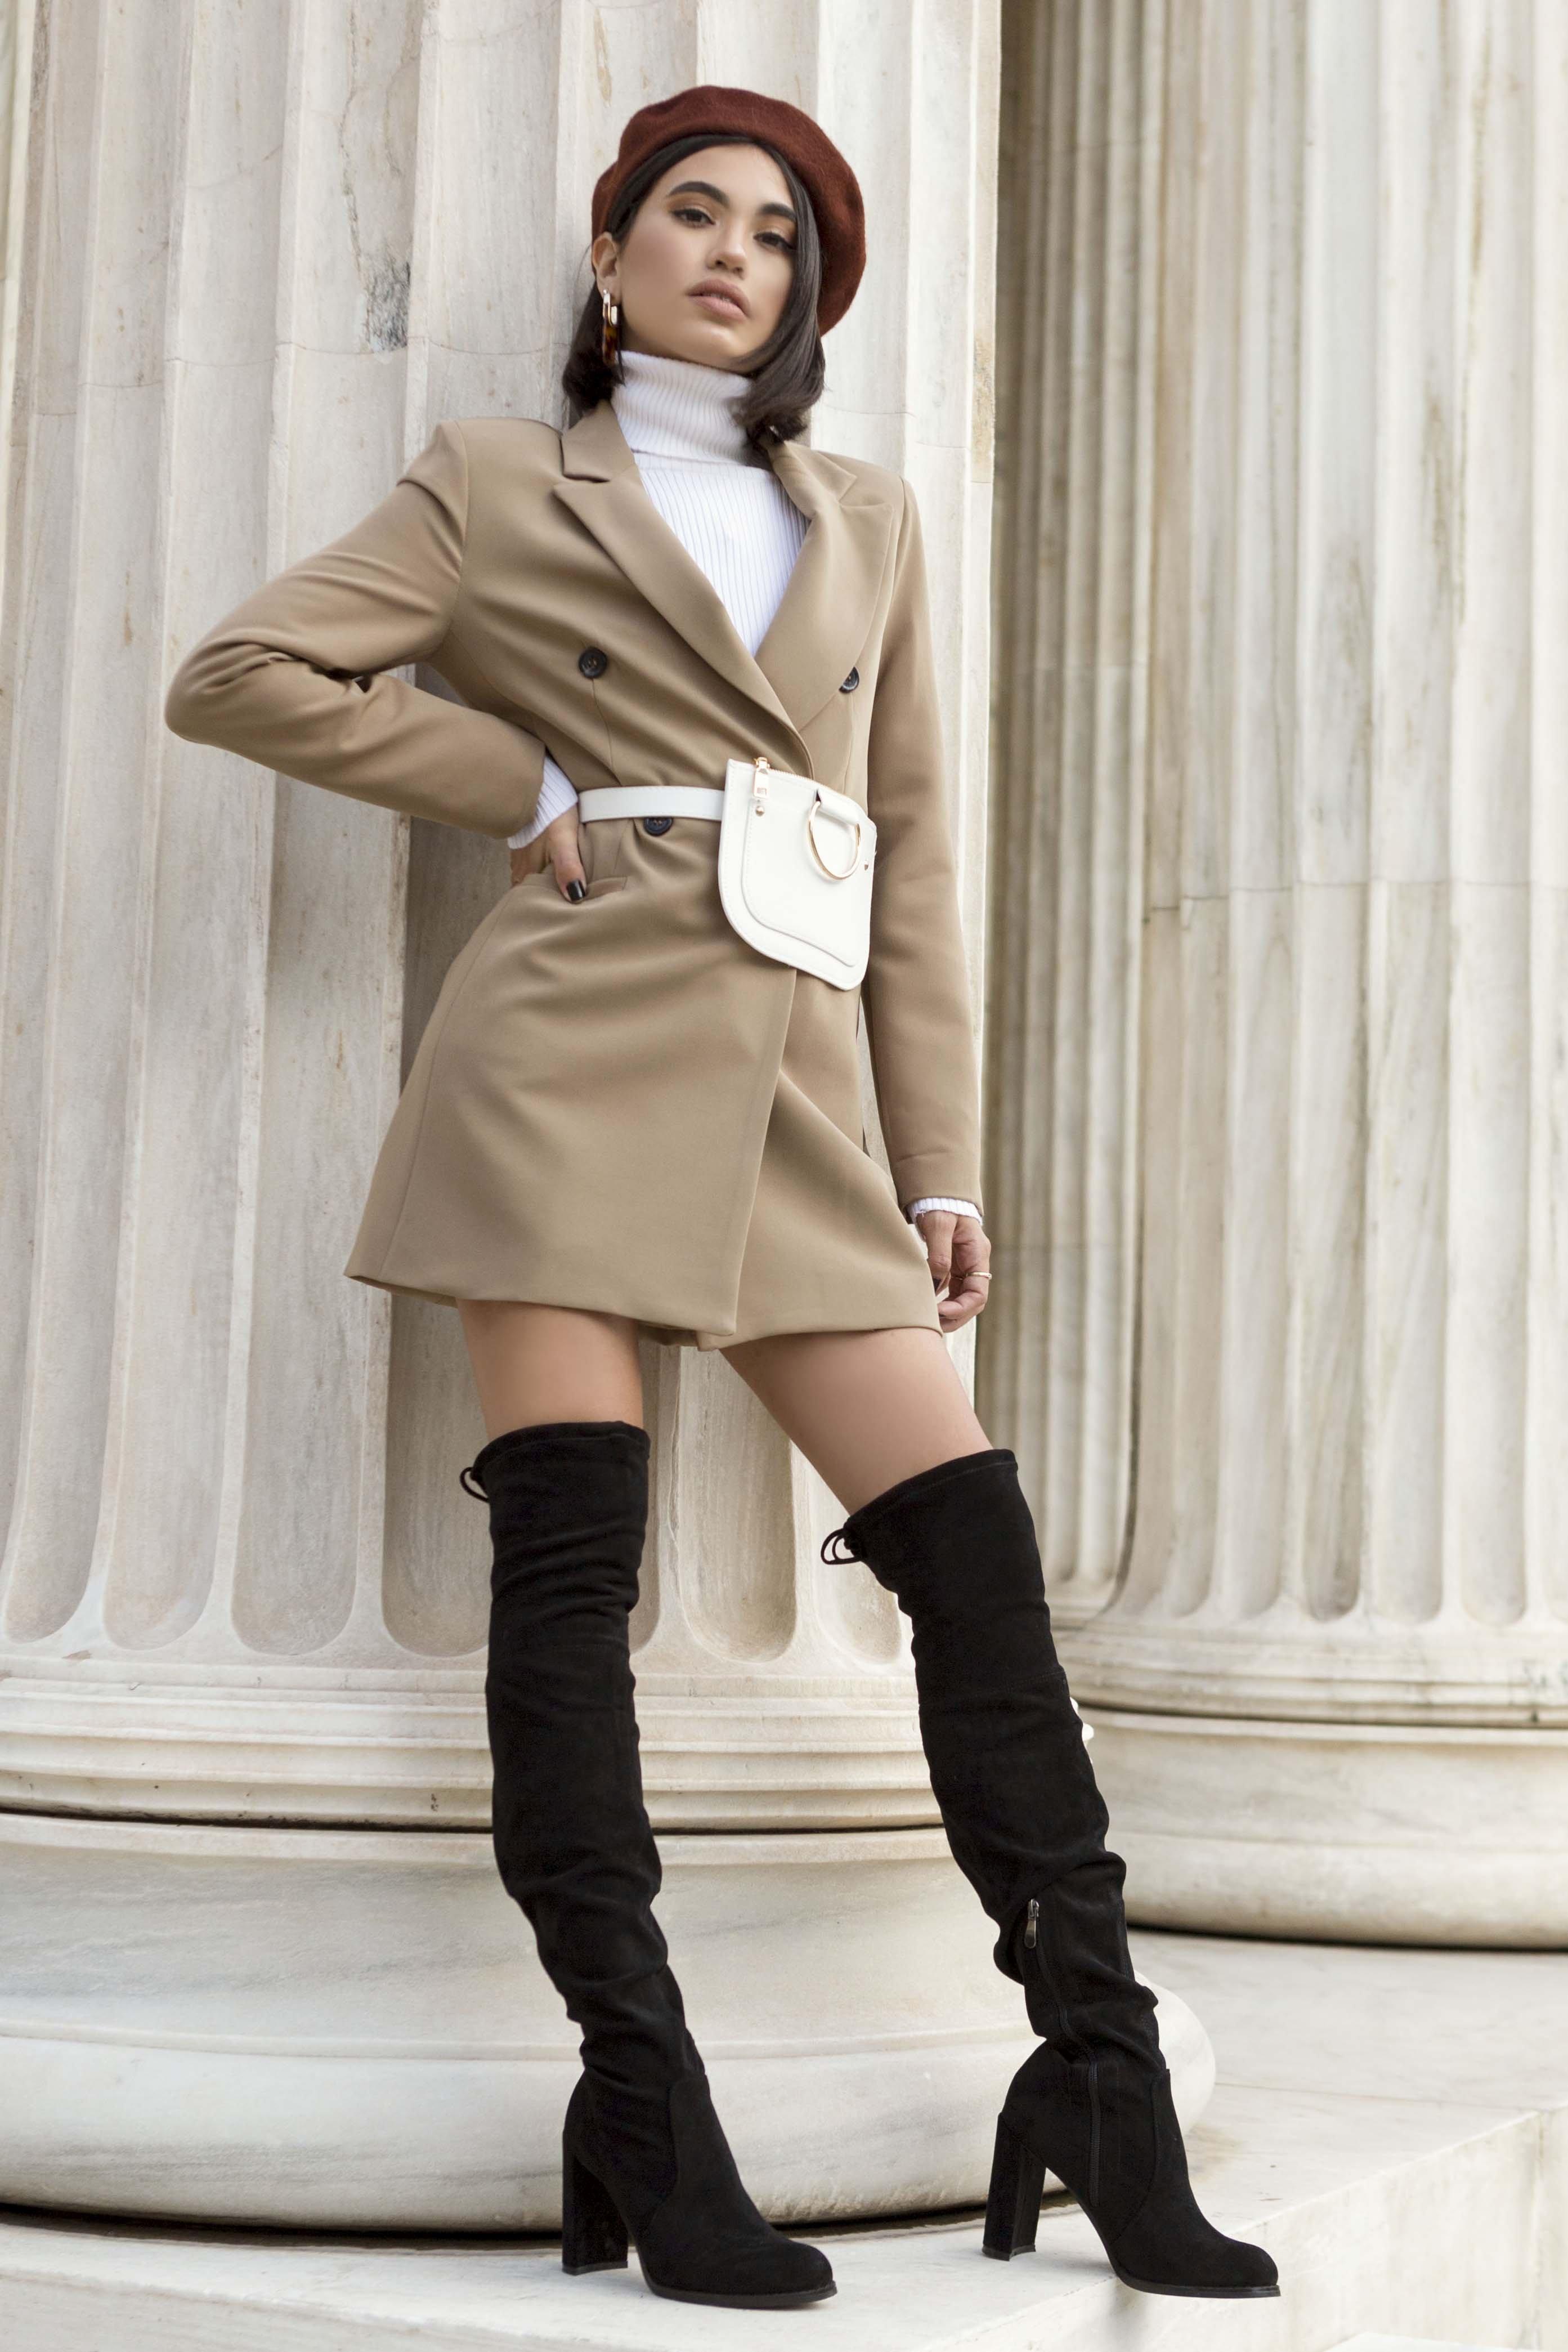 198ce866d5dd ΦΟΡΕΜΑ ΣΑΚΑΚΙ - CLOTHES -> Φορέματα & Φόρμες -> Mini φορέματα | Made of  Grace